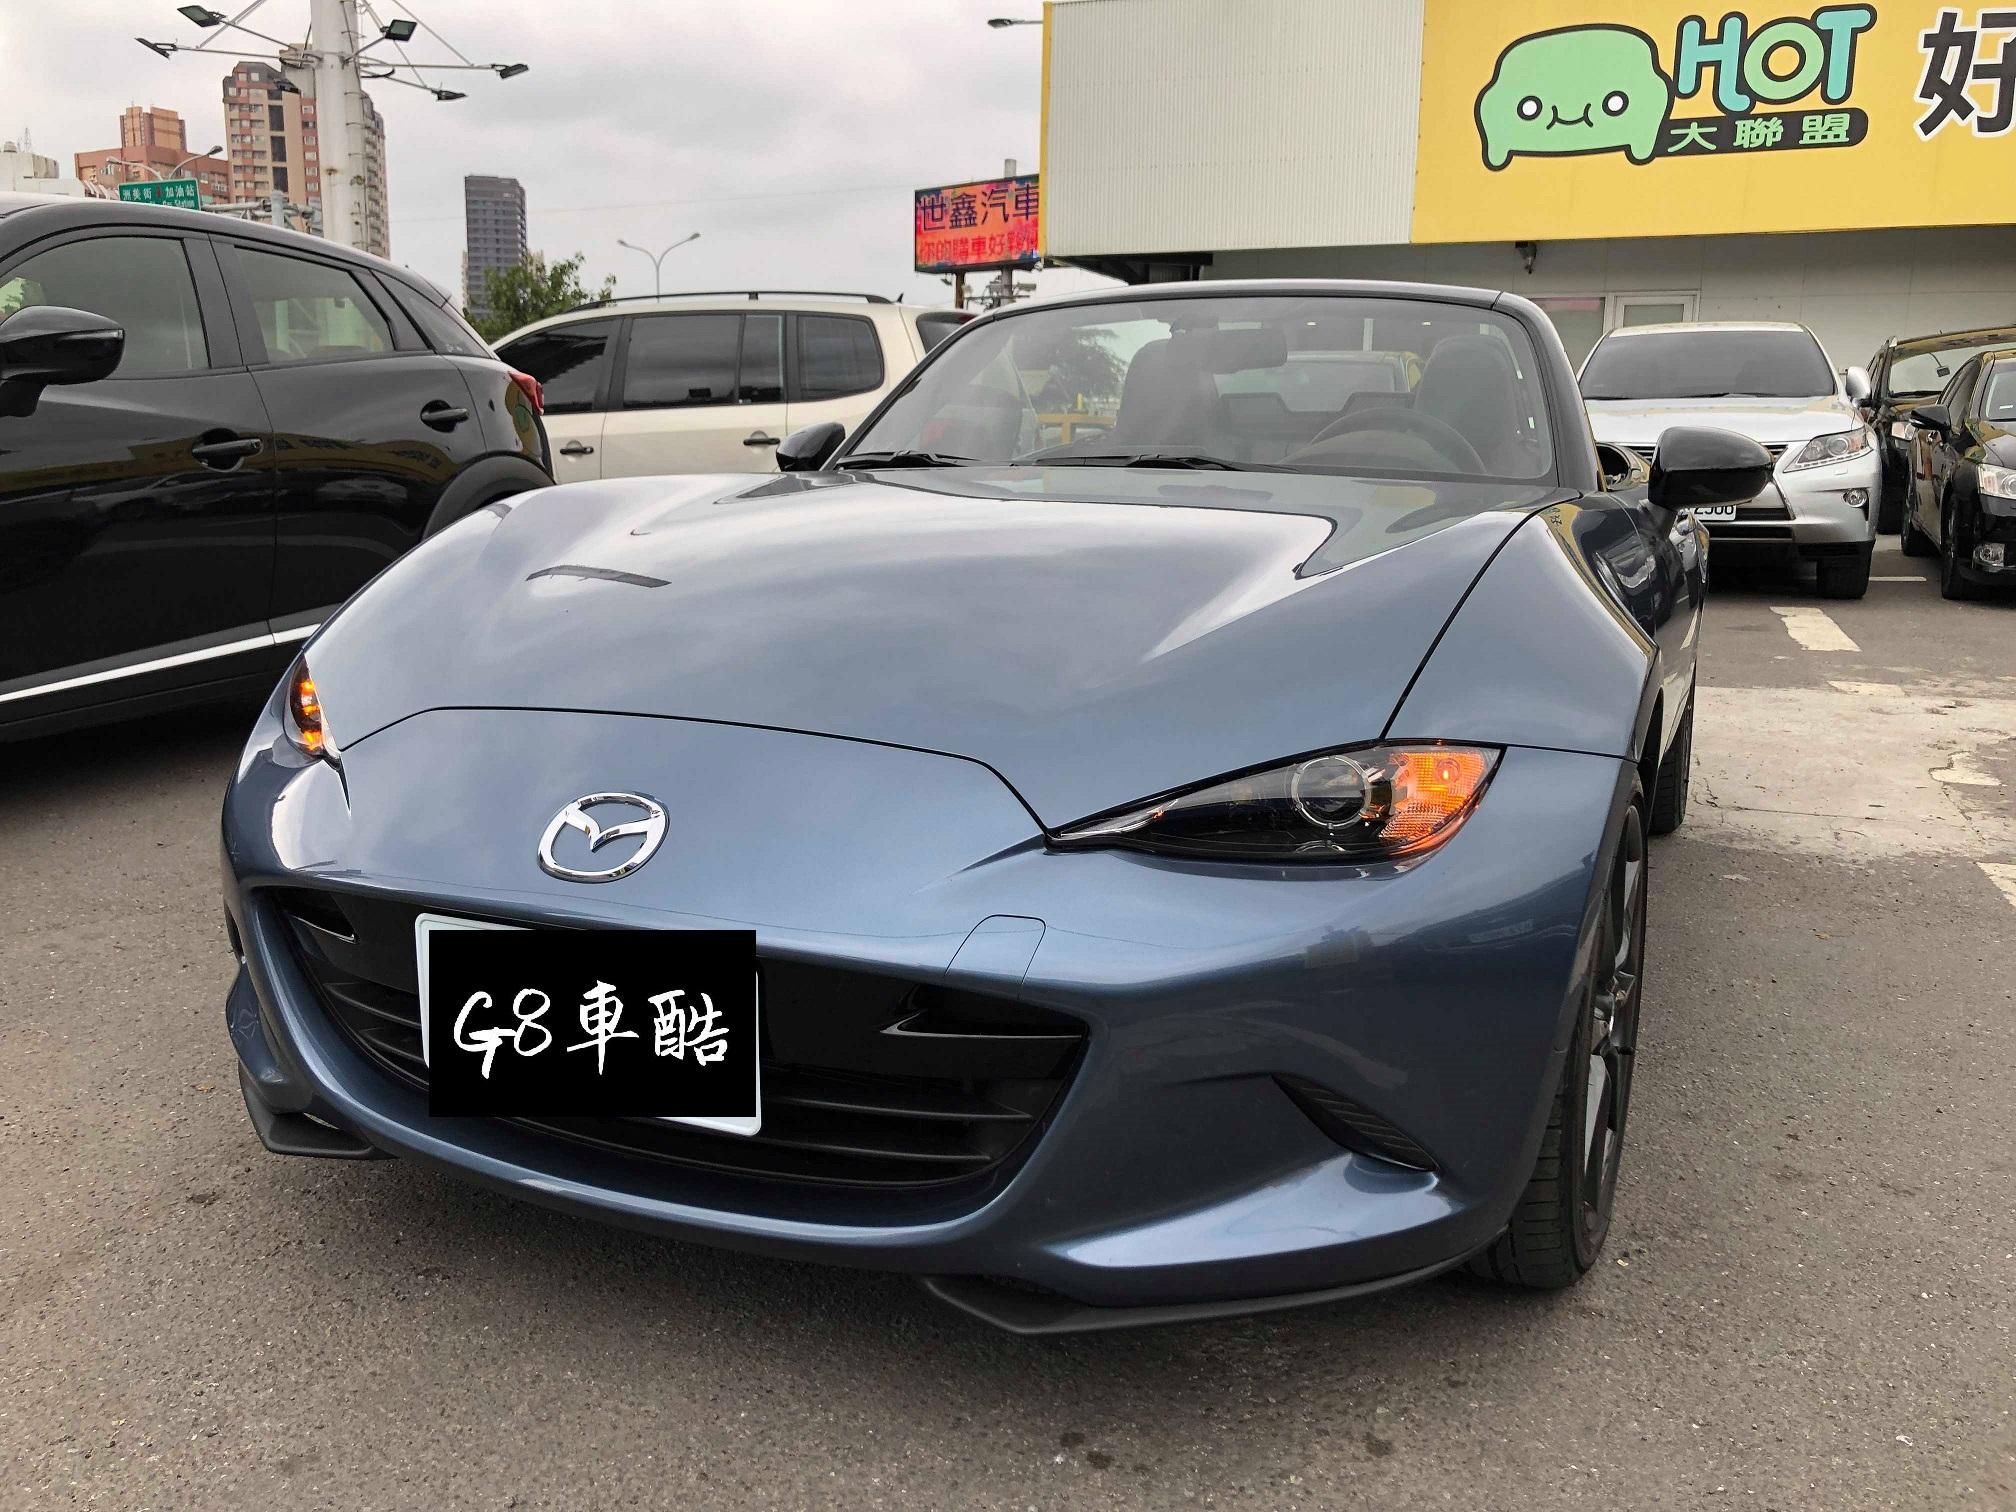 2017 Mazda 馬自達 Mx-5